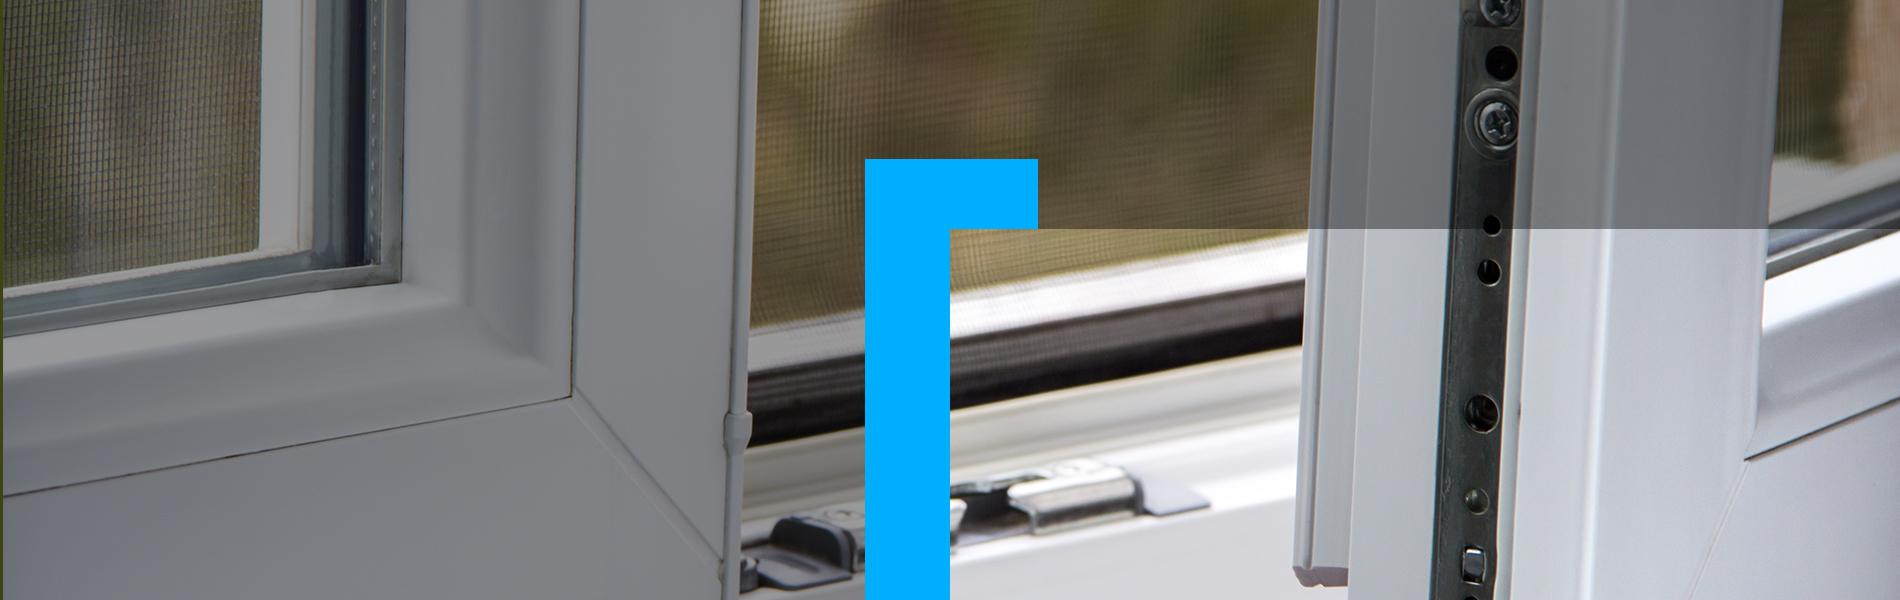 Azurenov - Produits - Fenêtres - HEADER